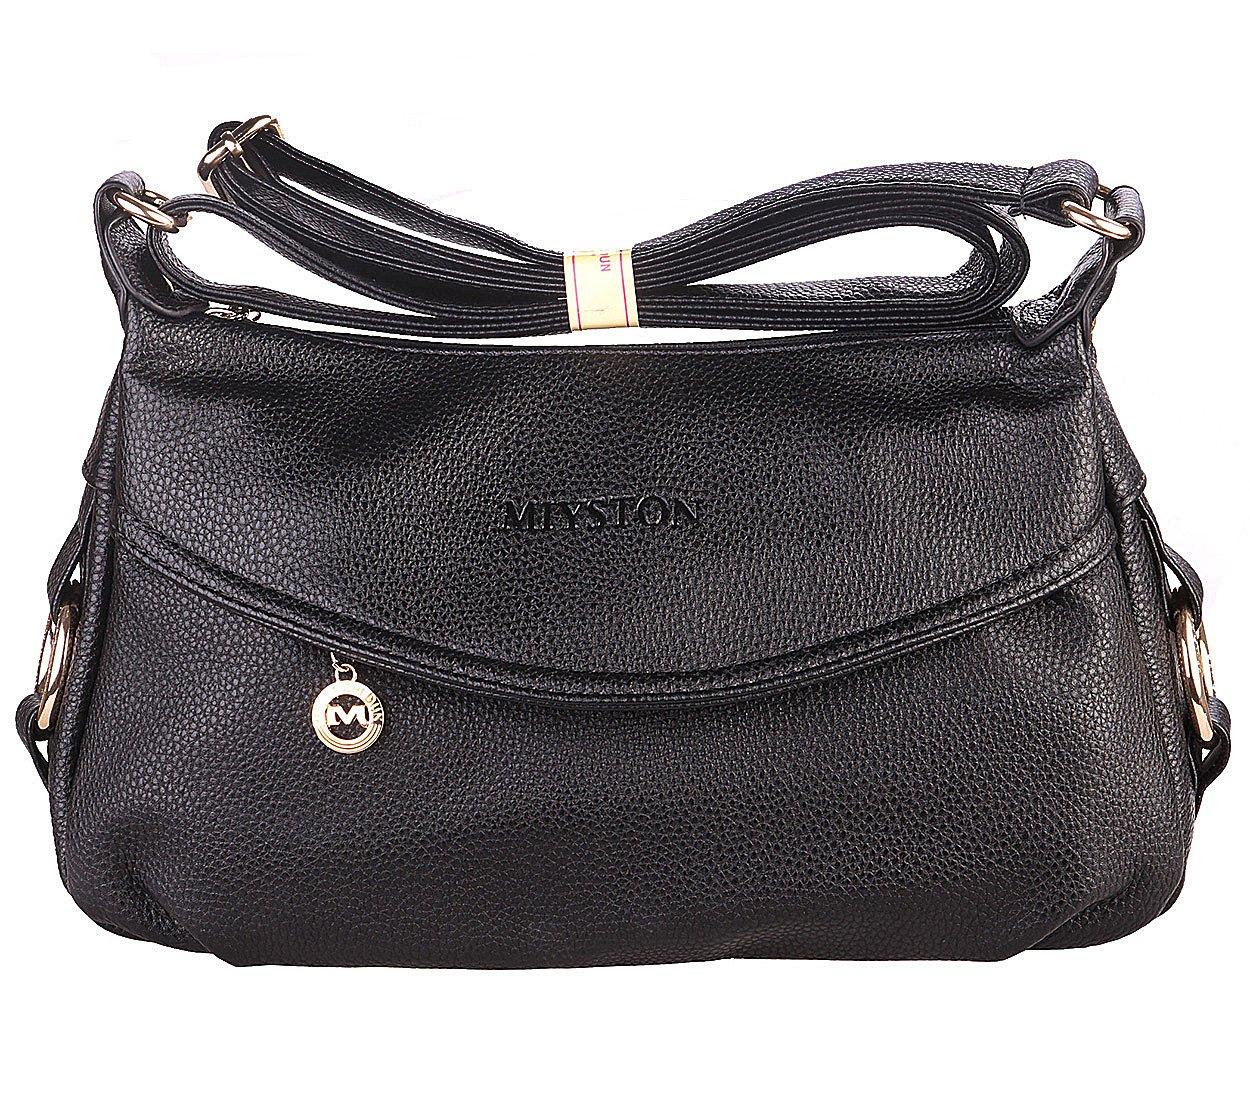 Women's Fashion Genuine Leather Cross Body Shoulder Bag Hobo Style Purse Satchel Handbag for Ladies (Black)